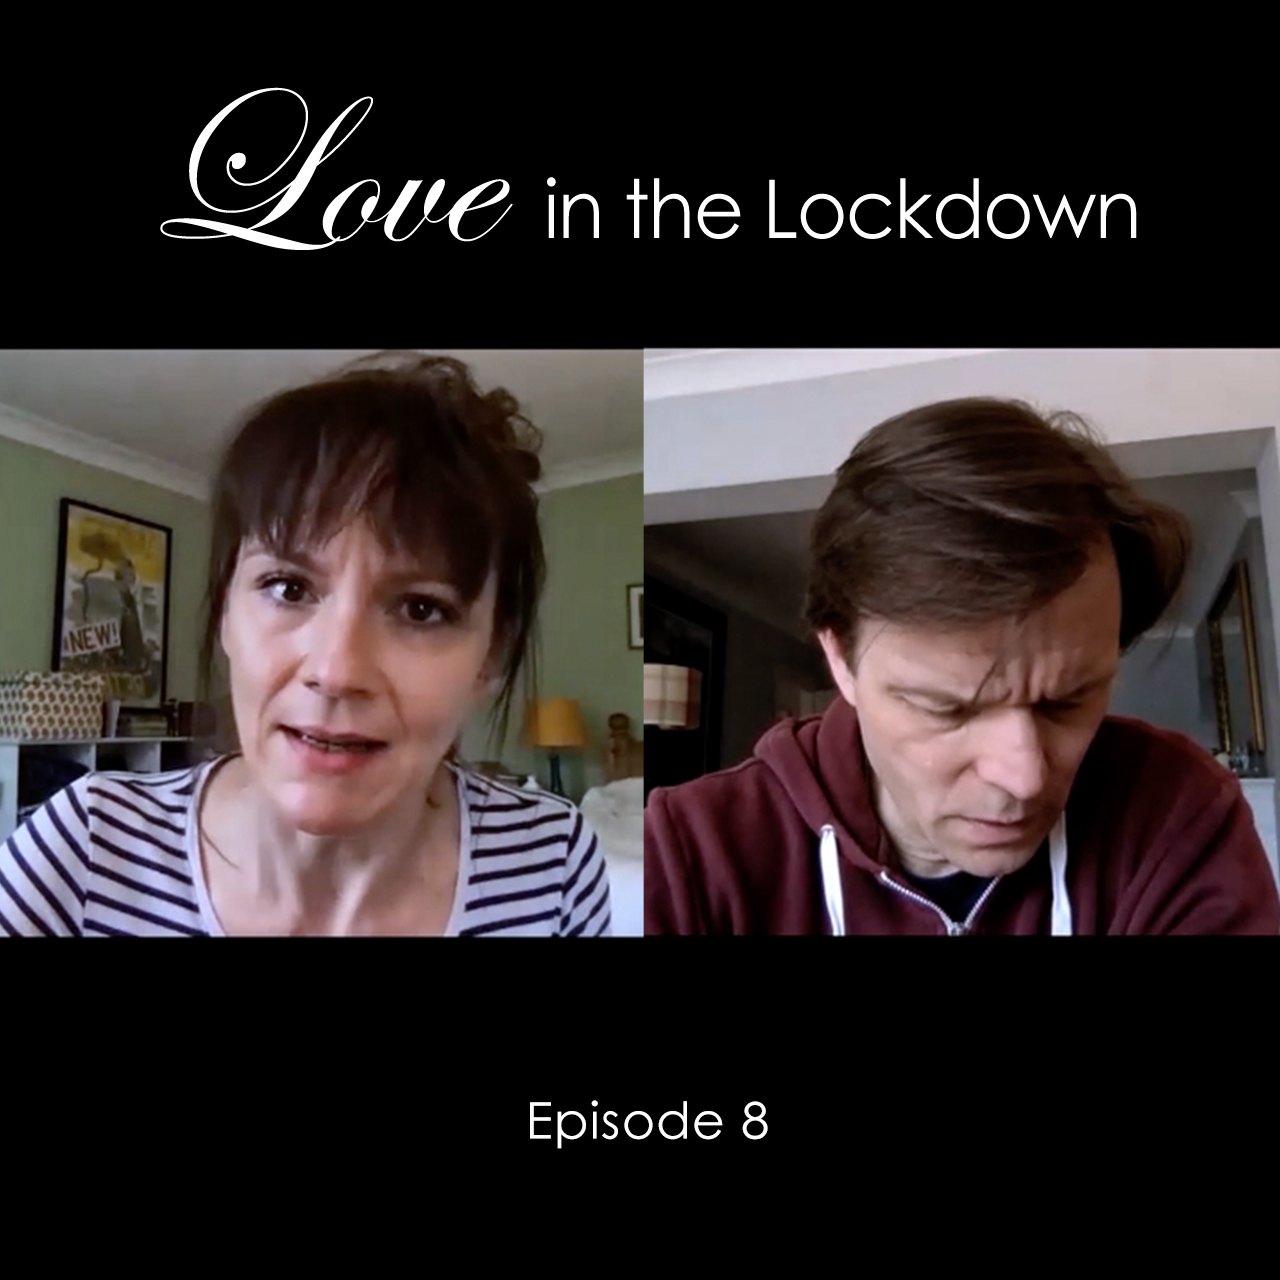 Love in the Lockdown Episode 8 Thumbnail